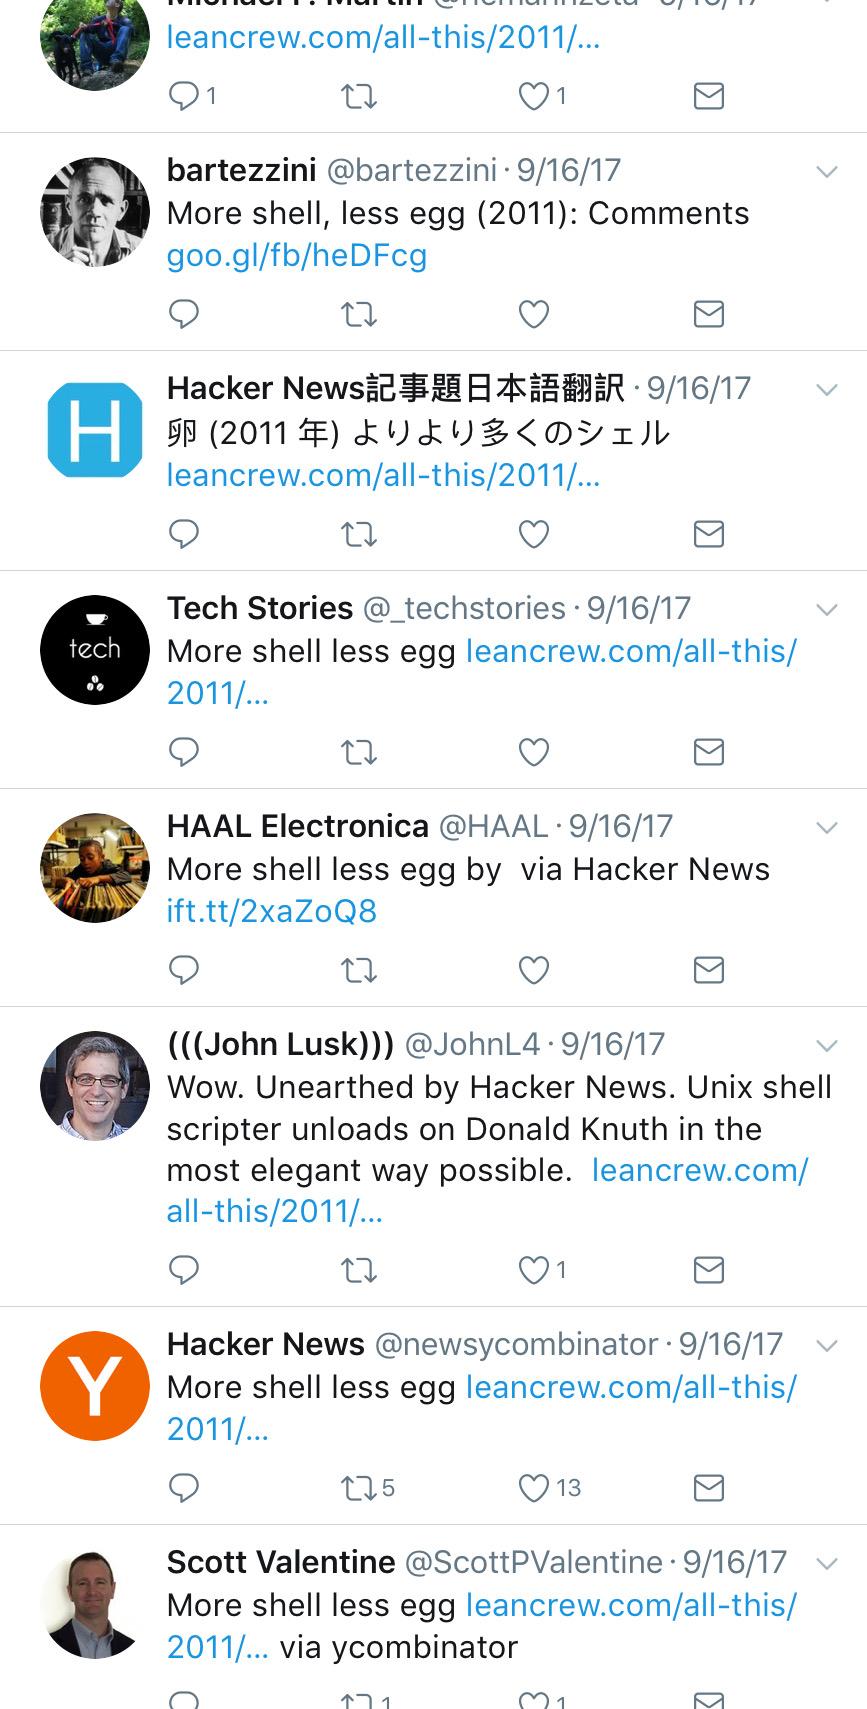 Tweets via Hacker News